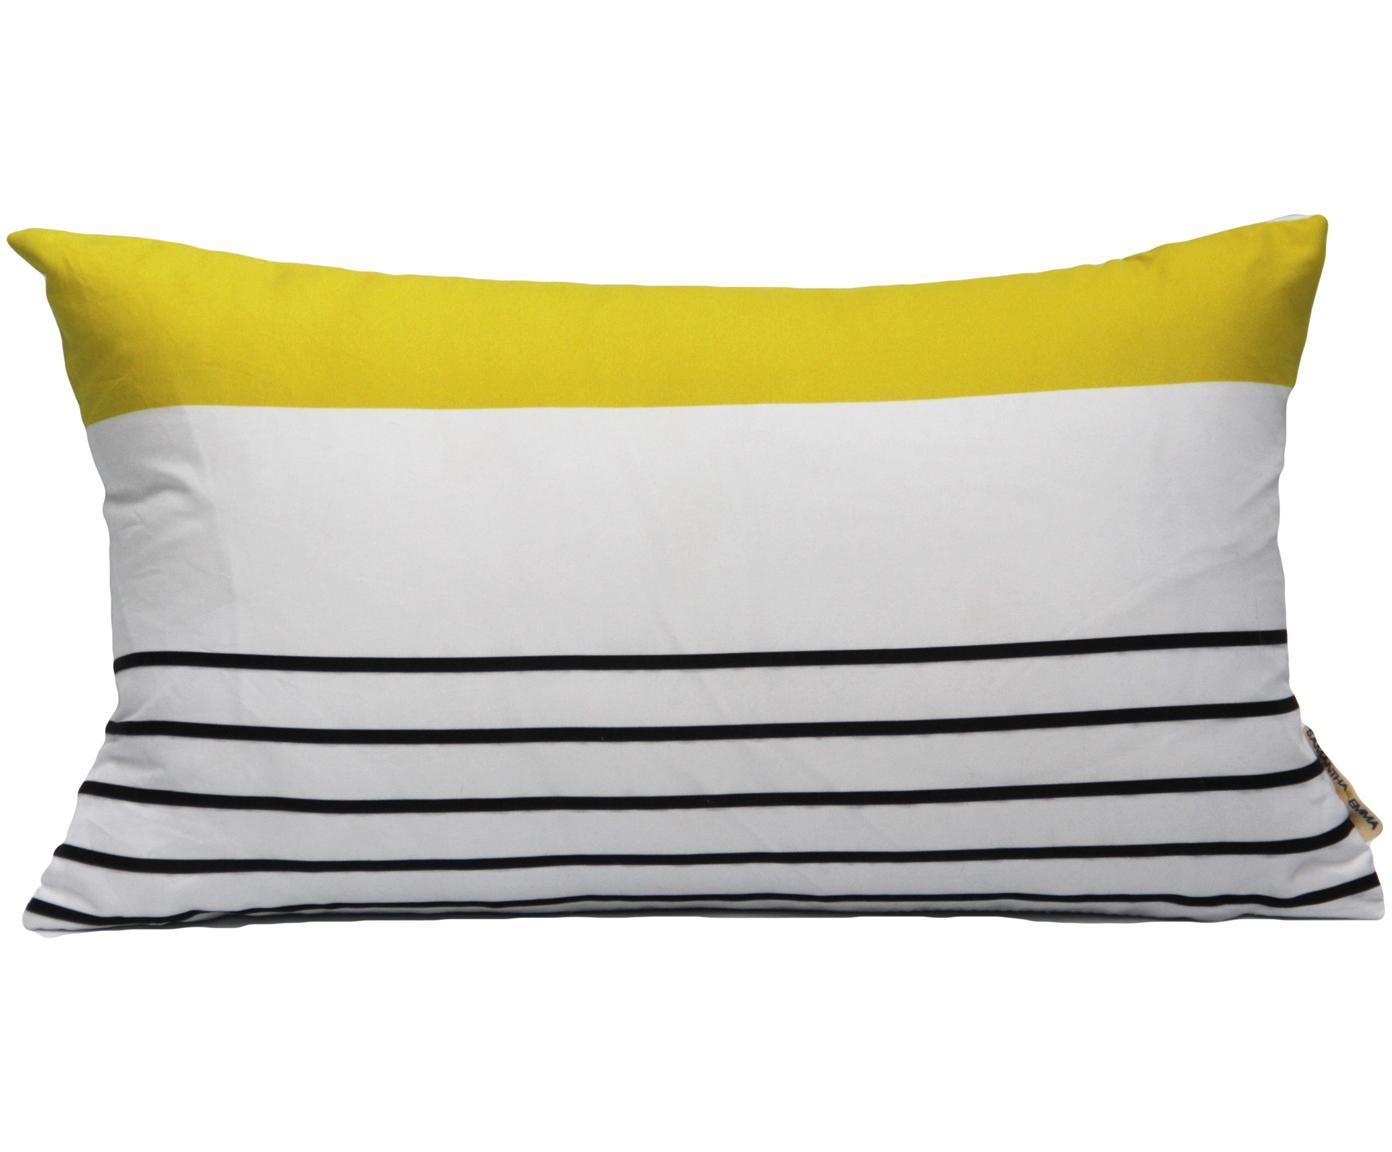 Kissenhülle Magdalena, 100% Polyester, Weiss, Gelb, Schwarz, 30 x 50 cm